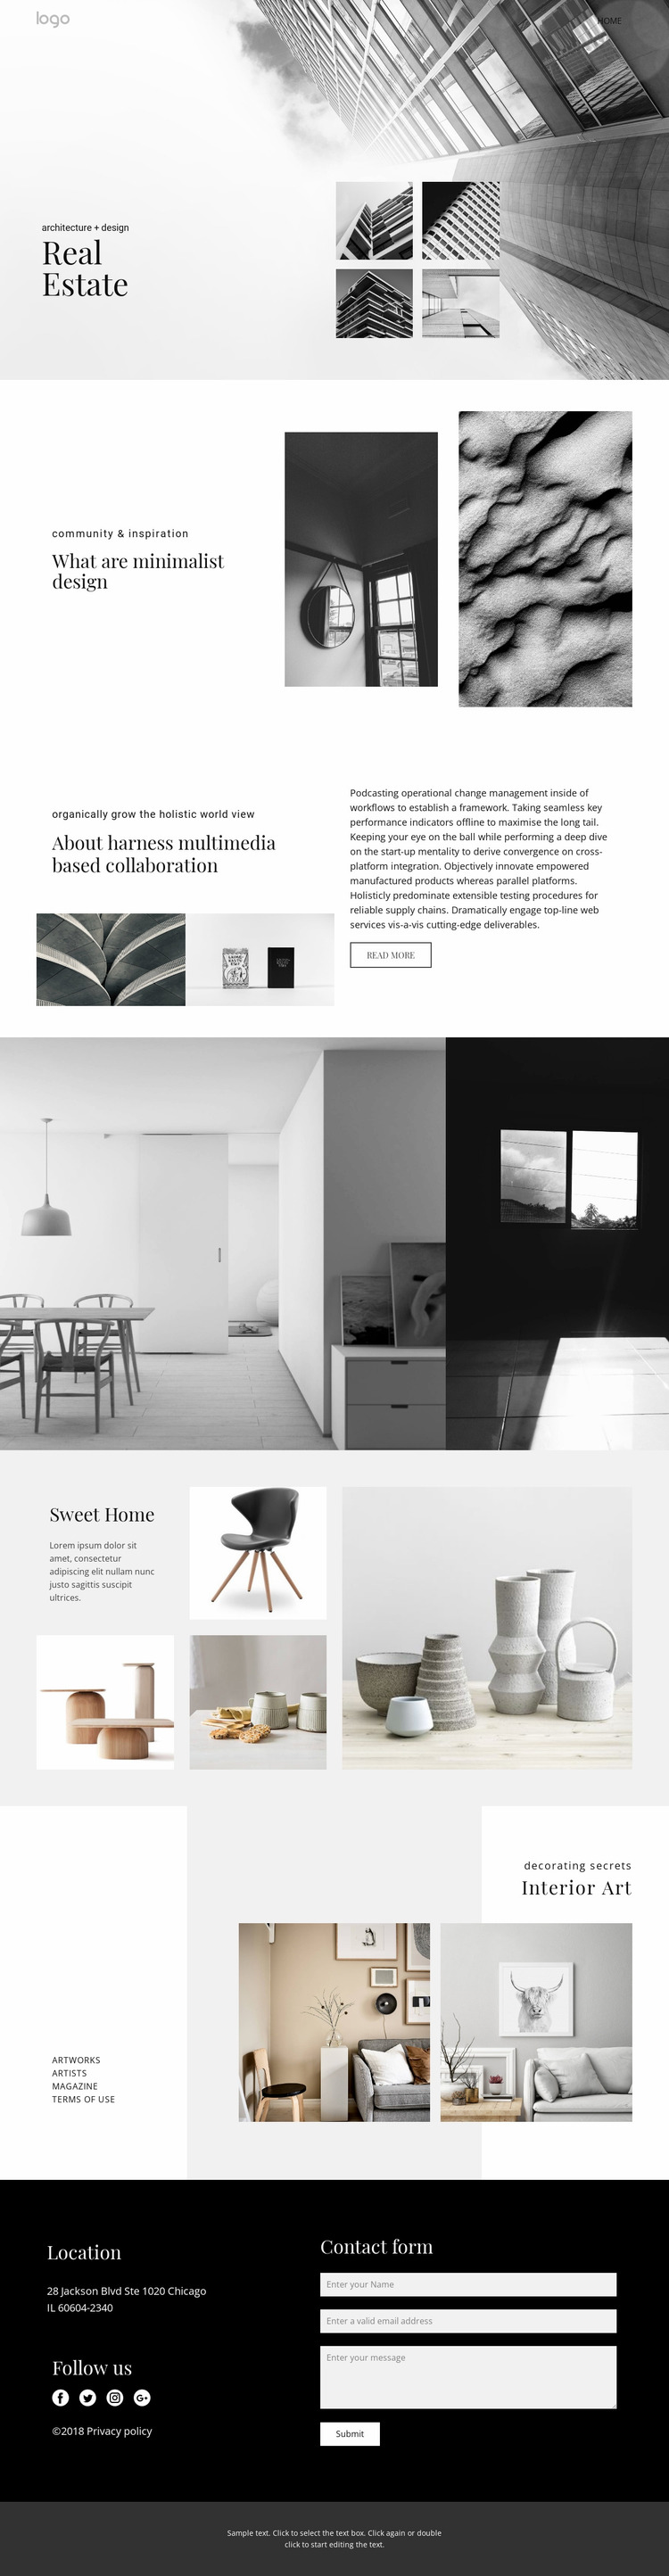 Real estate agency for people Website Mockup